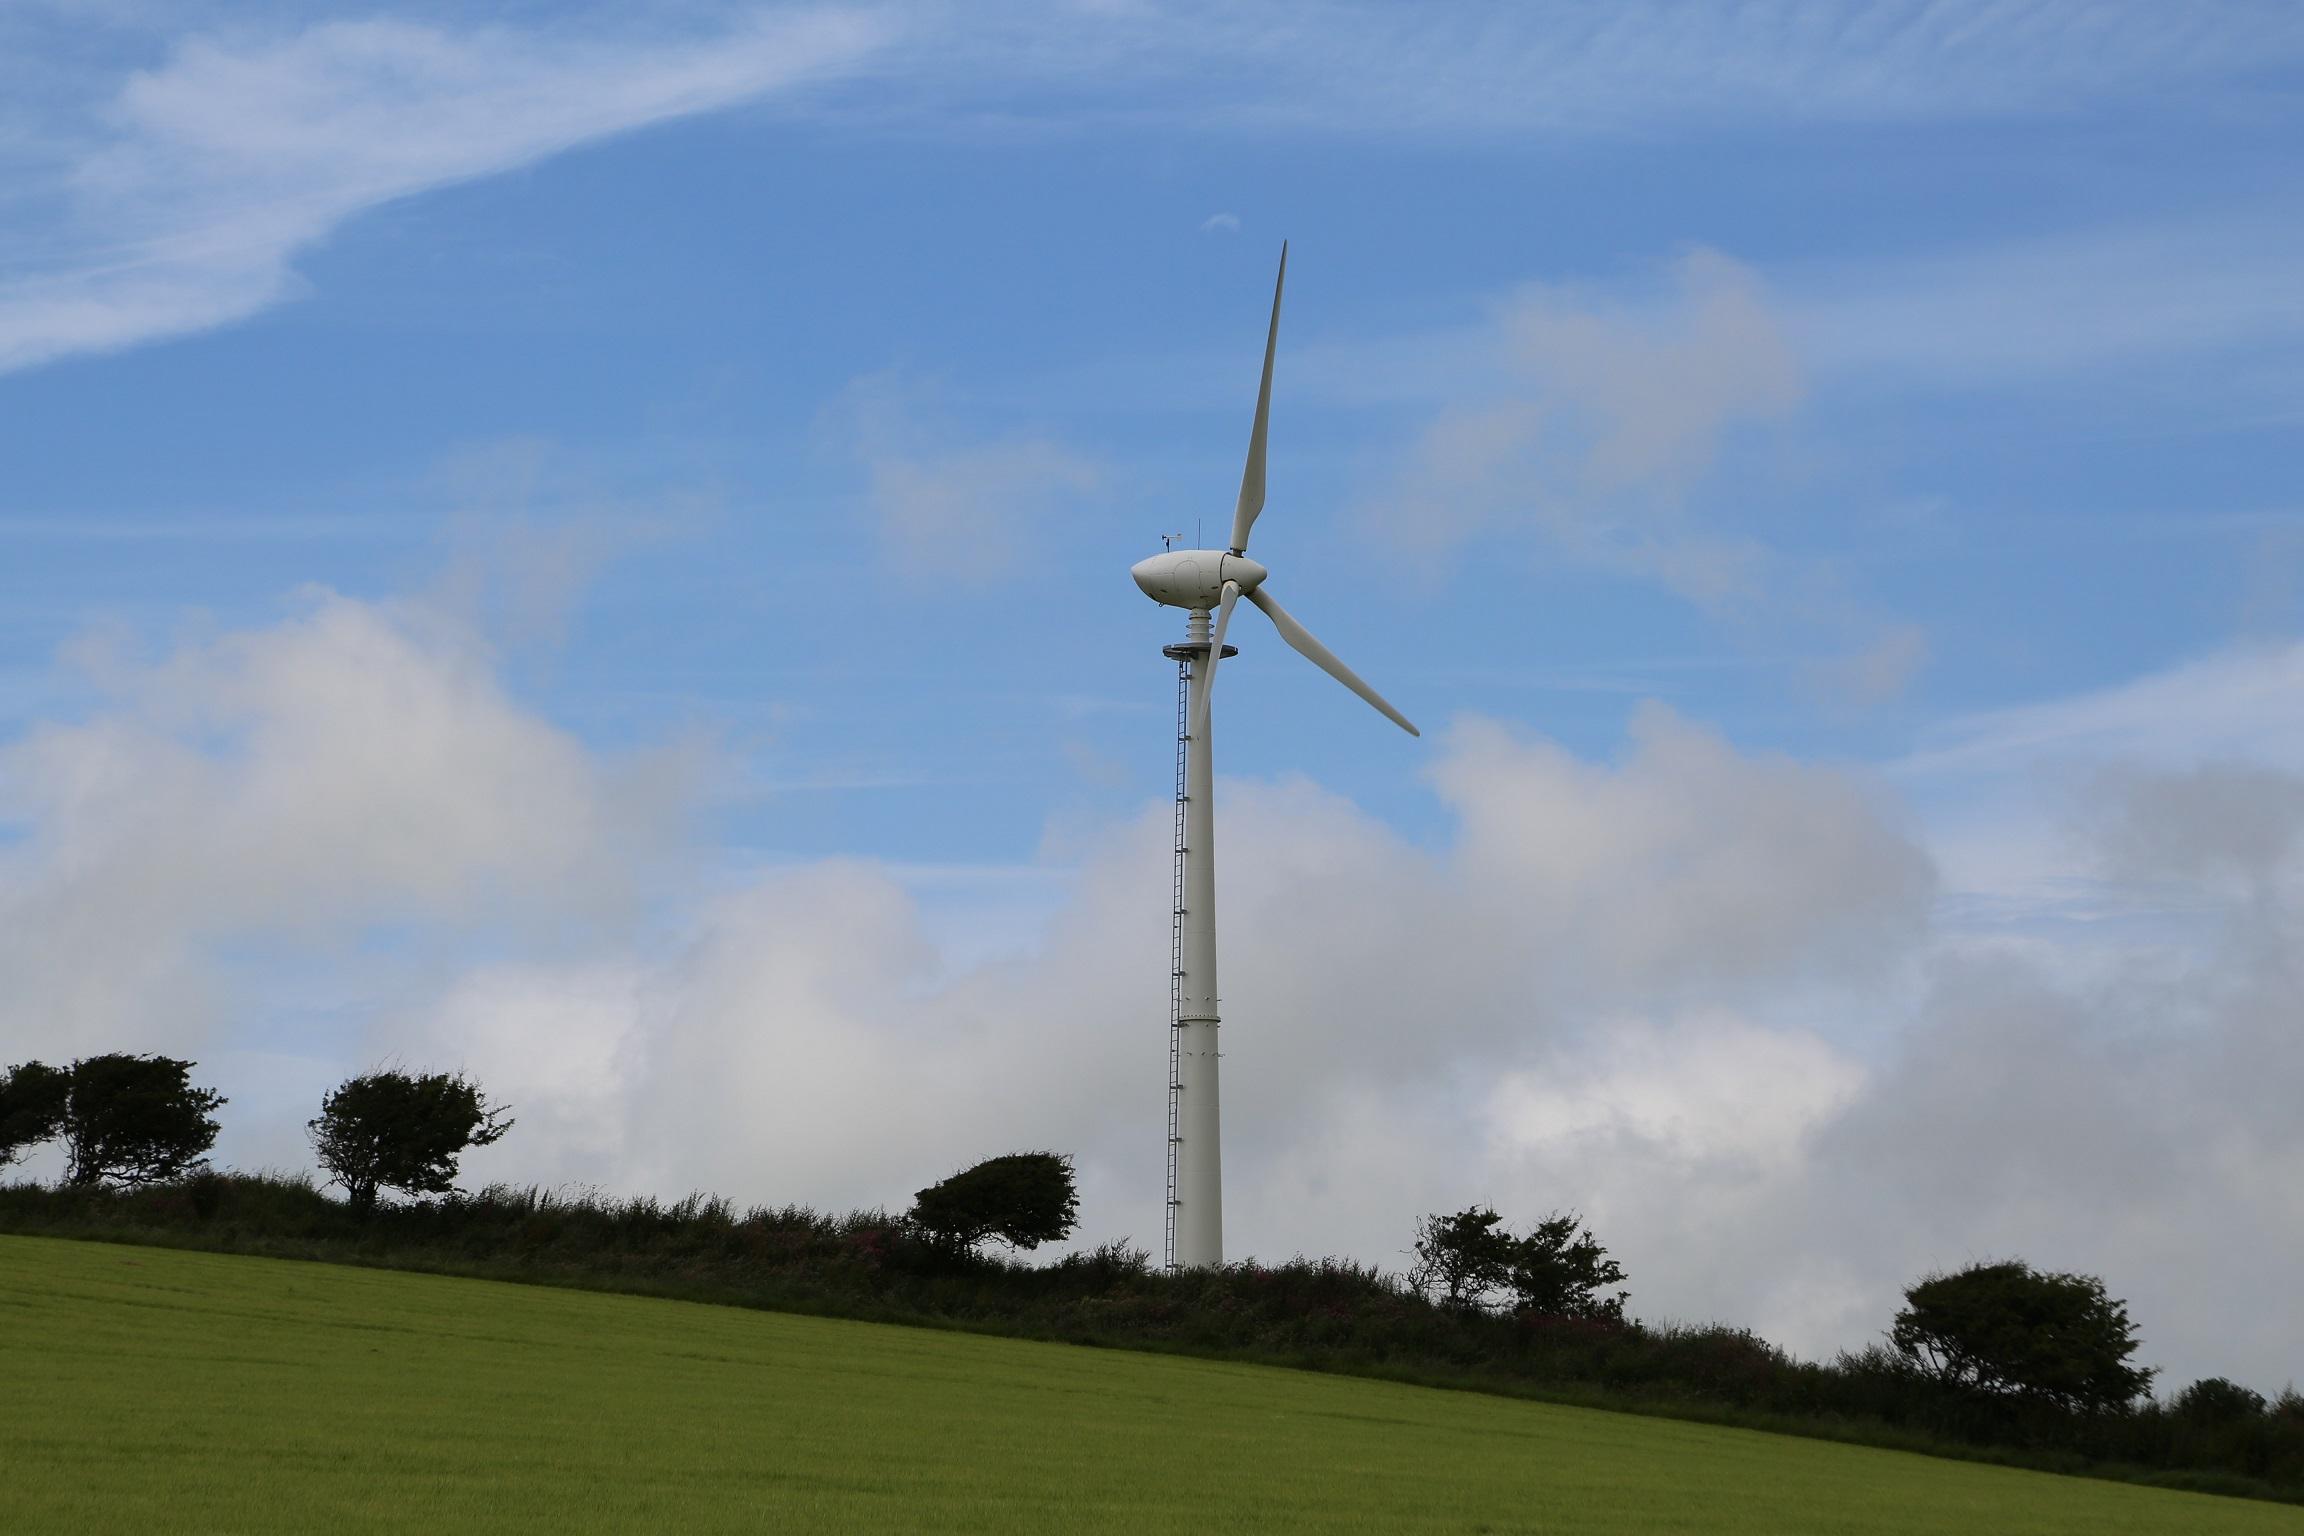 Endurance E 3120 50 00 kW Wind turbine